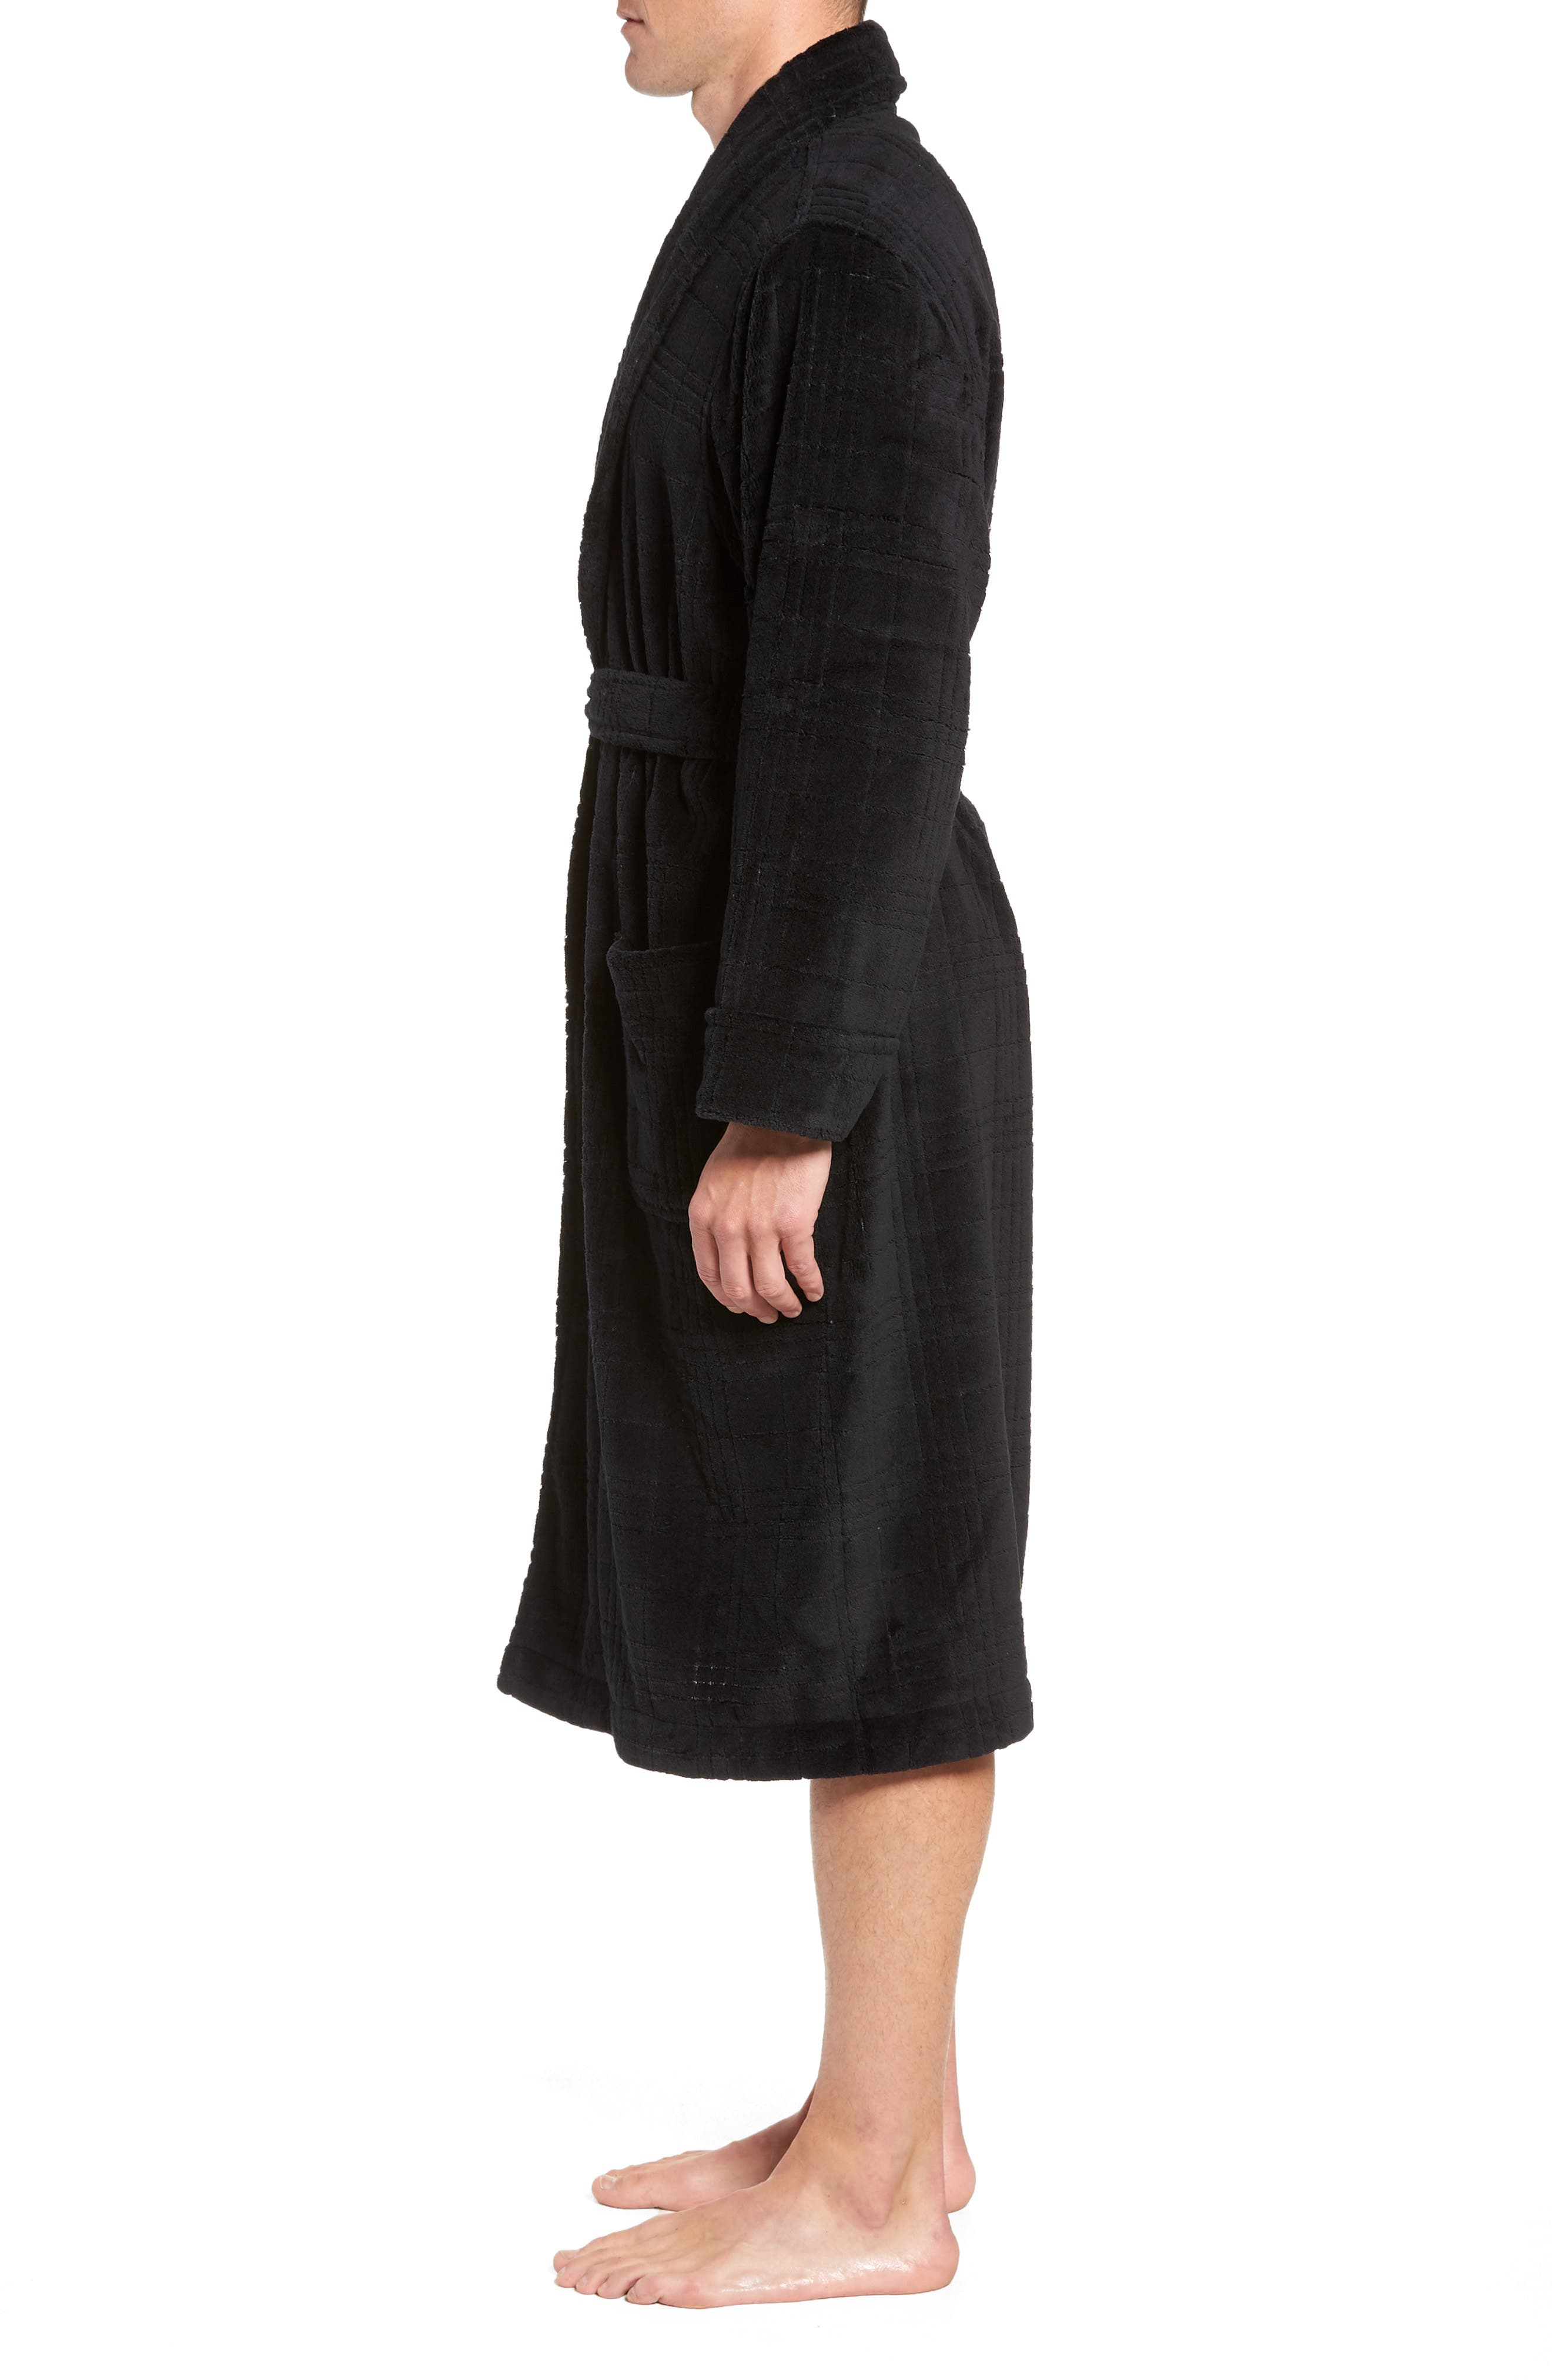 NORDSTROM MEN'S SHOP, Shadow Plaid Fleece Robe, Alternate thumbnail 3, color, BLACK